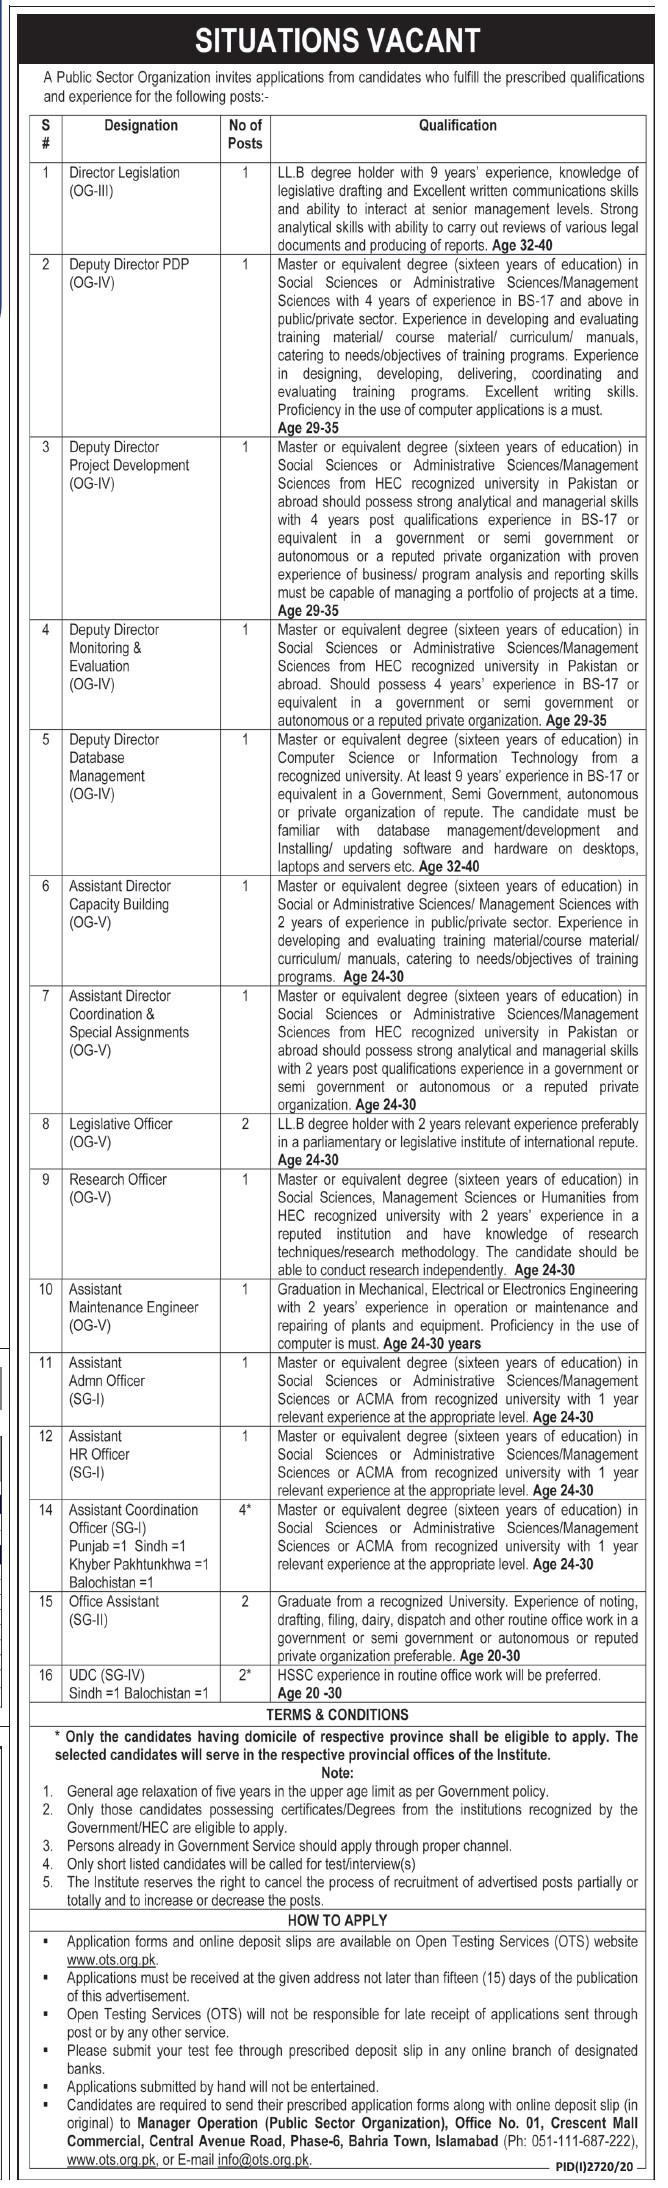 Public Sector Organization, Government of Pakistan